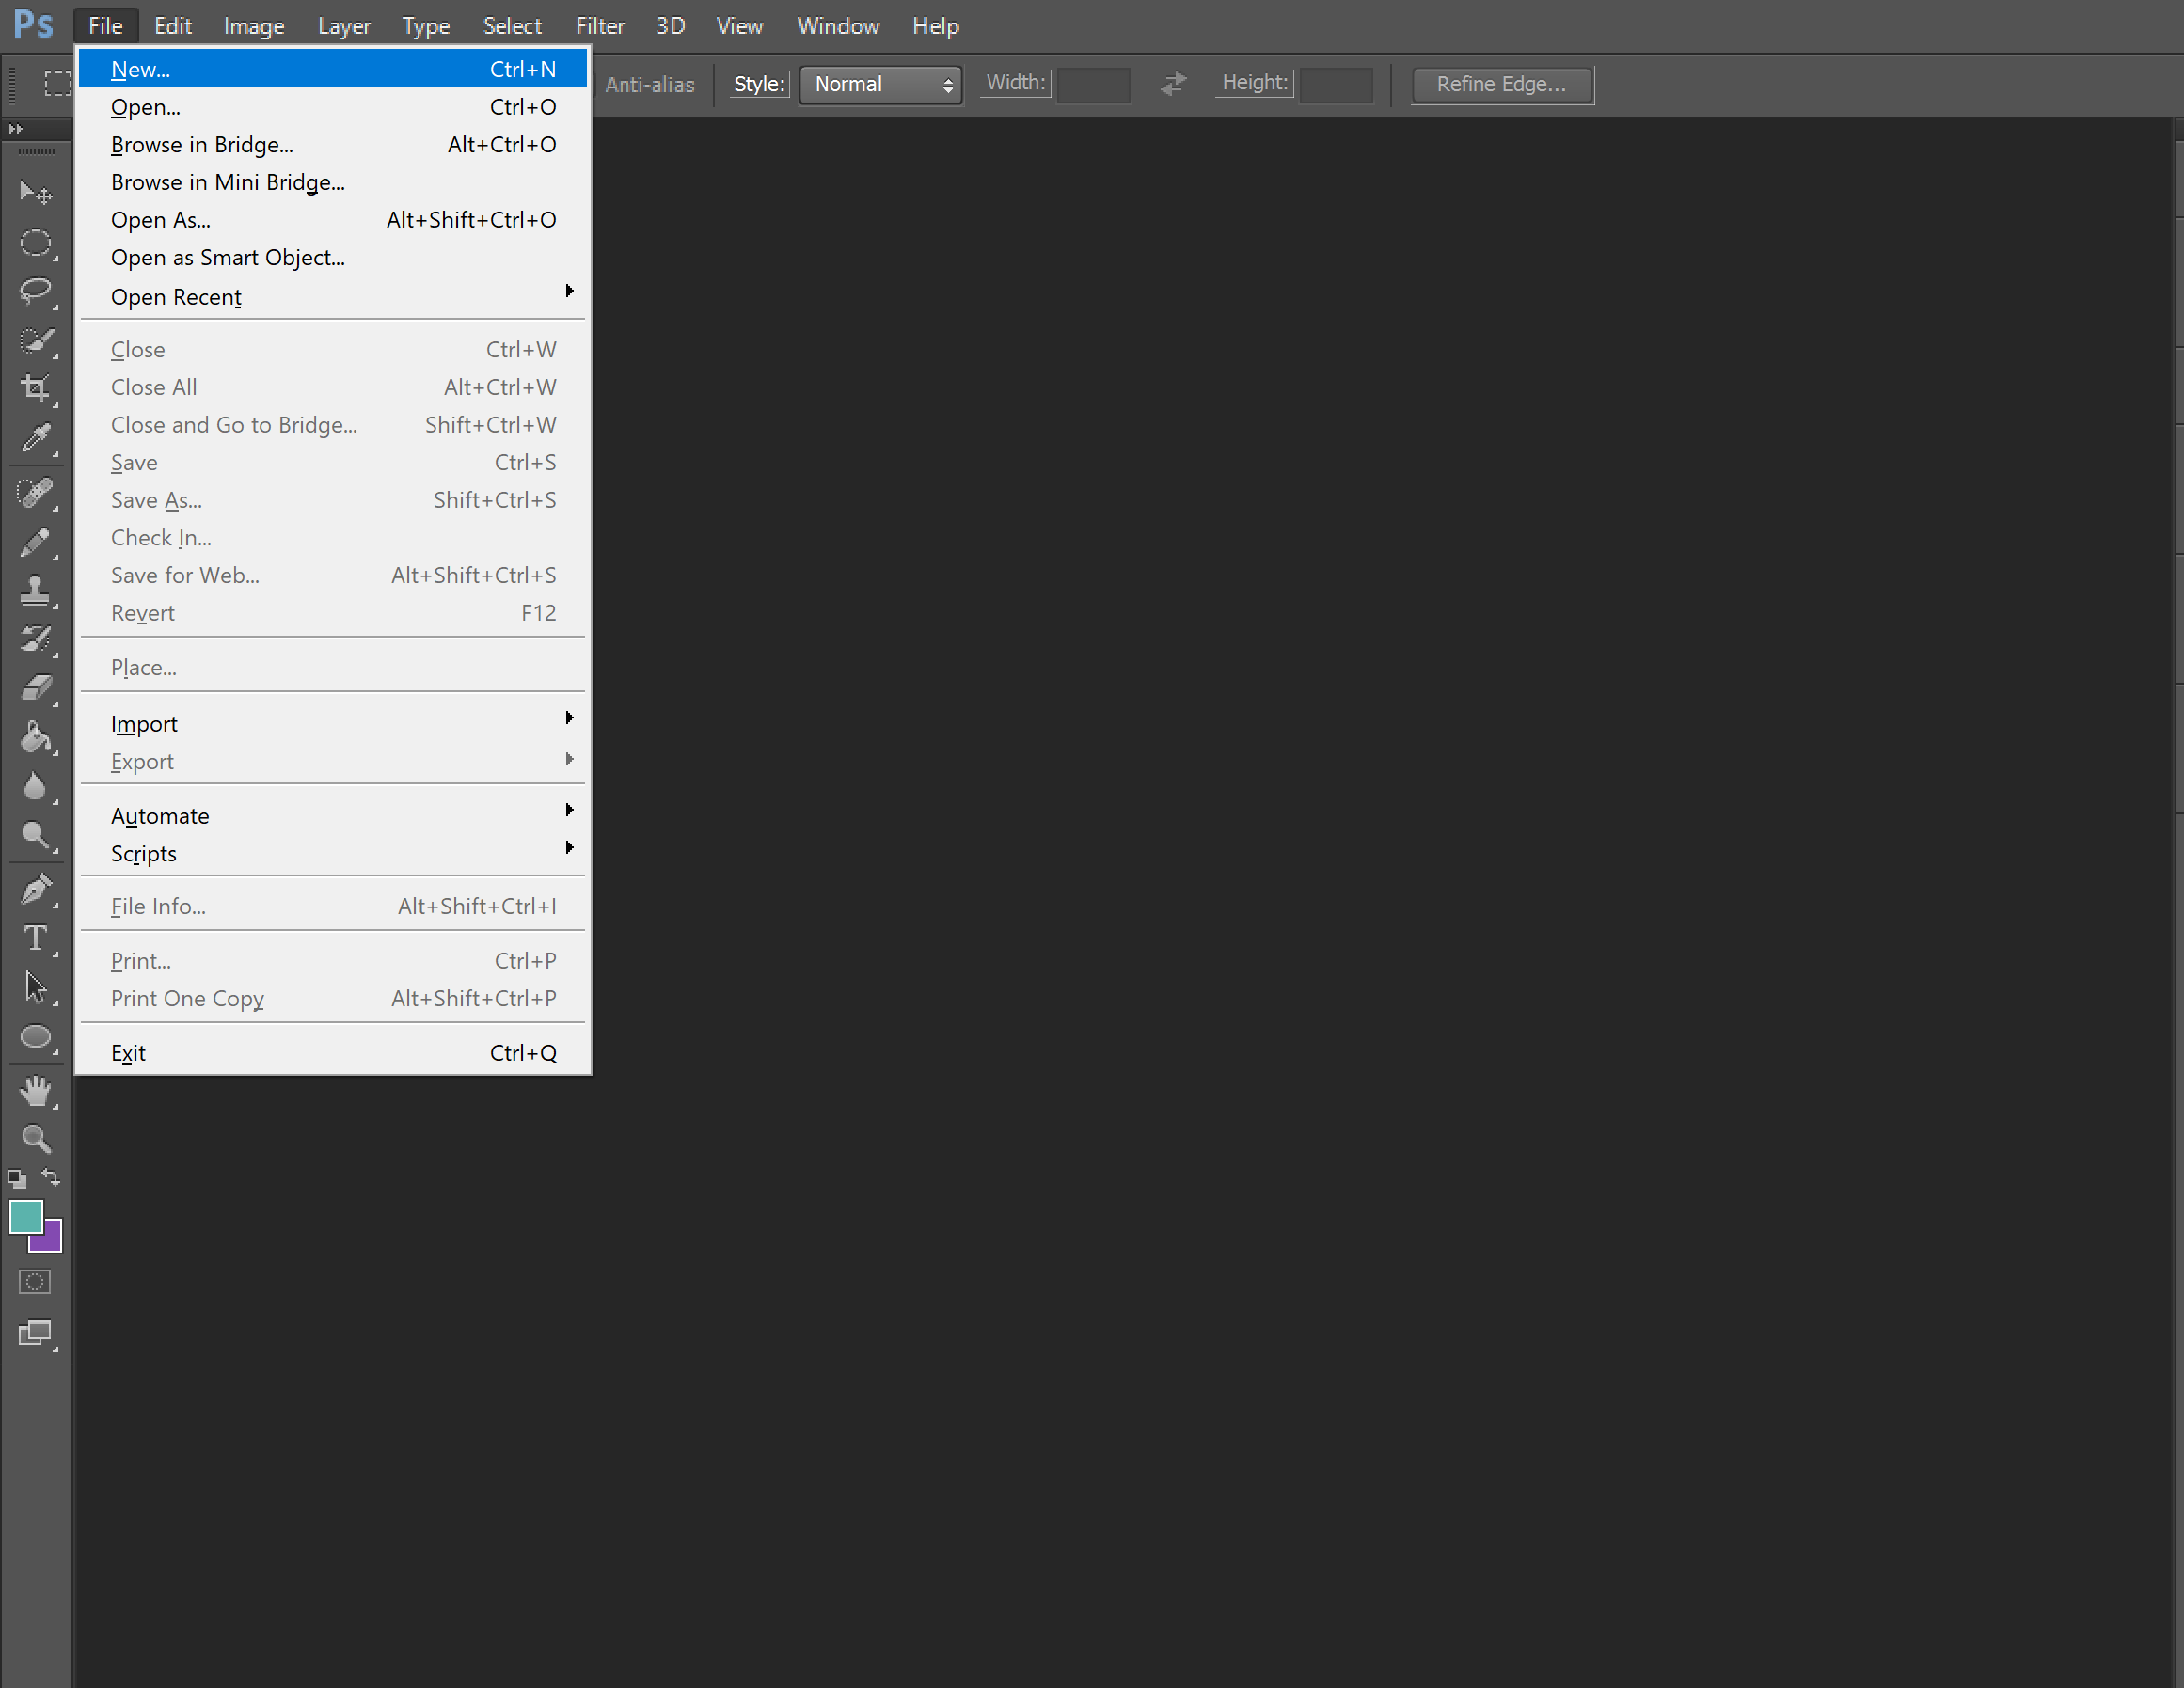 raster art, raster, raster editor, digital art, tutorials, how to, guide, beginners, krita, photoshop, windows 10, apps, art, programs, technology, open source, workspace, desktop, set up, configure, configuration, canvas, dpi